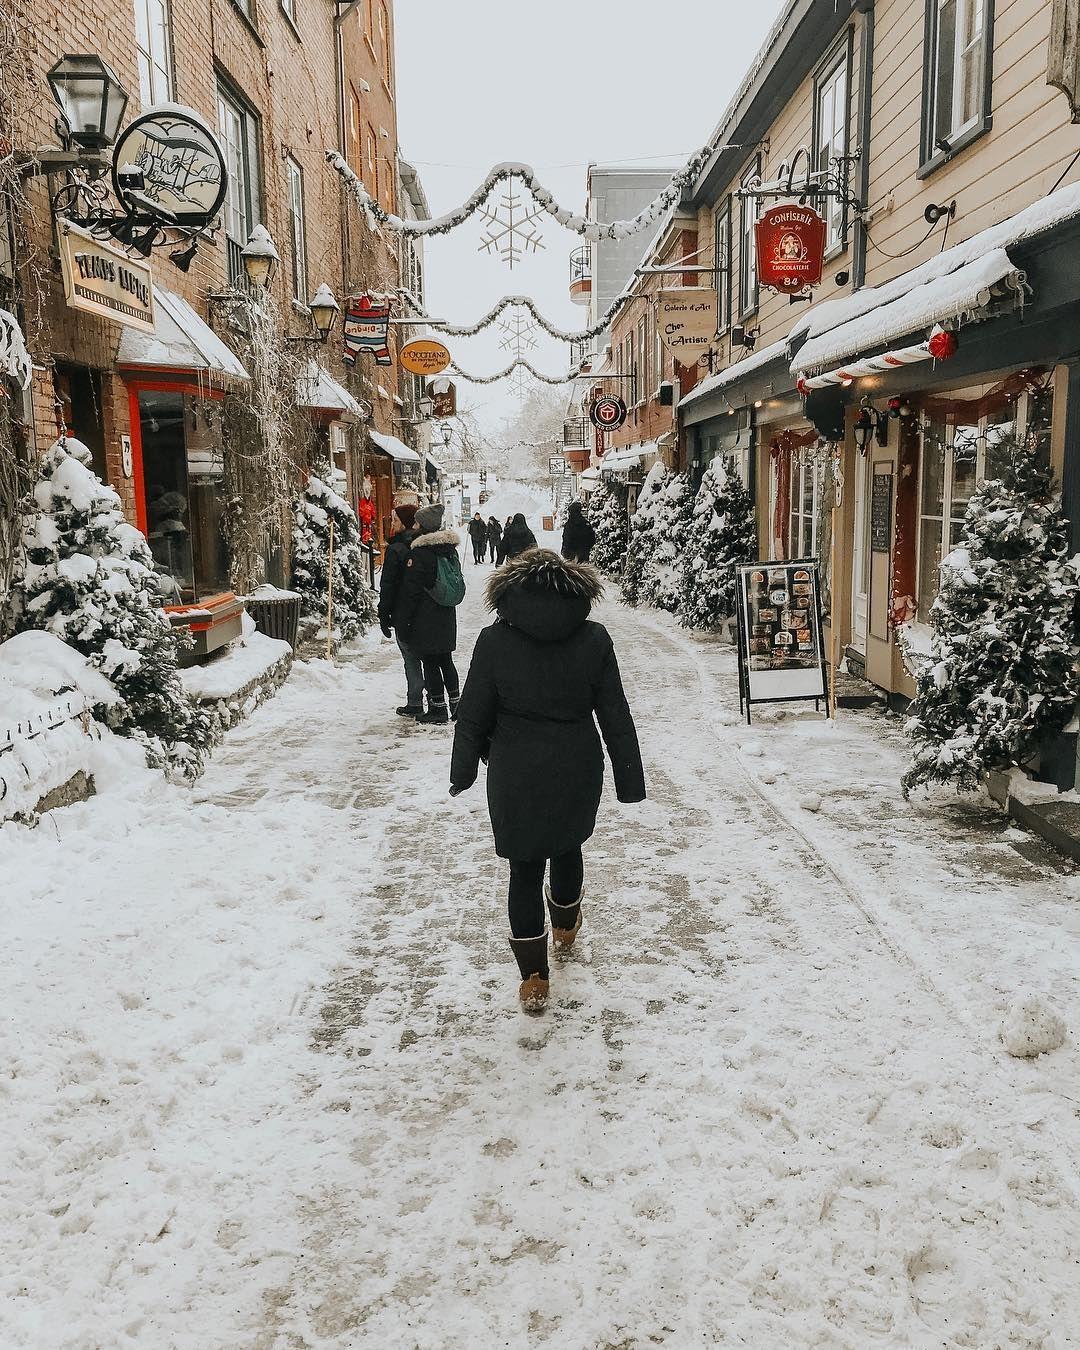 Sarah Melina Blog Trotteuse On Instagram The Cutest Street Of Quebec City Petit Champlain Quebec Canada Winter T Quebec City Champlain Quebec